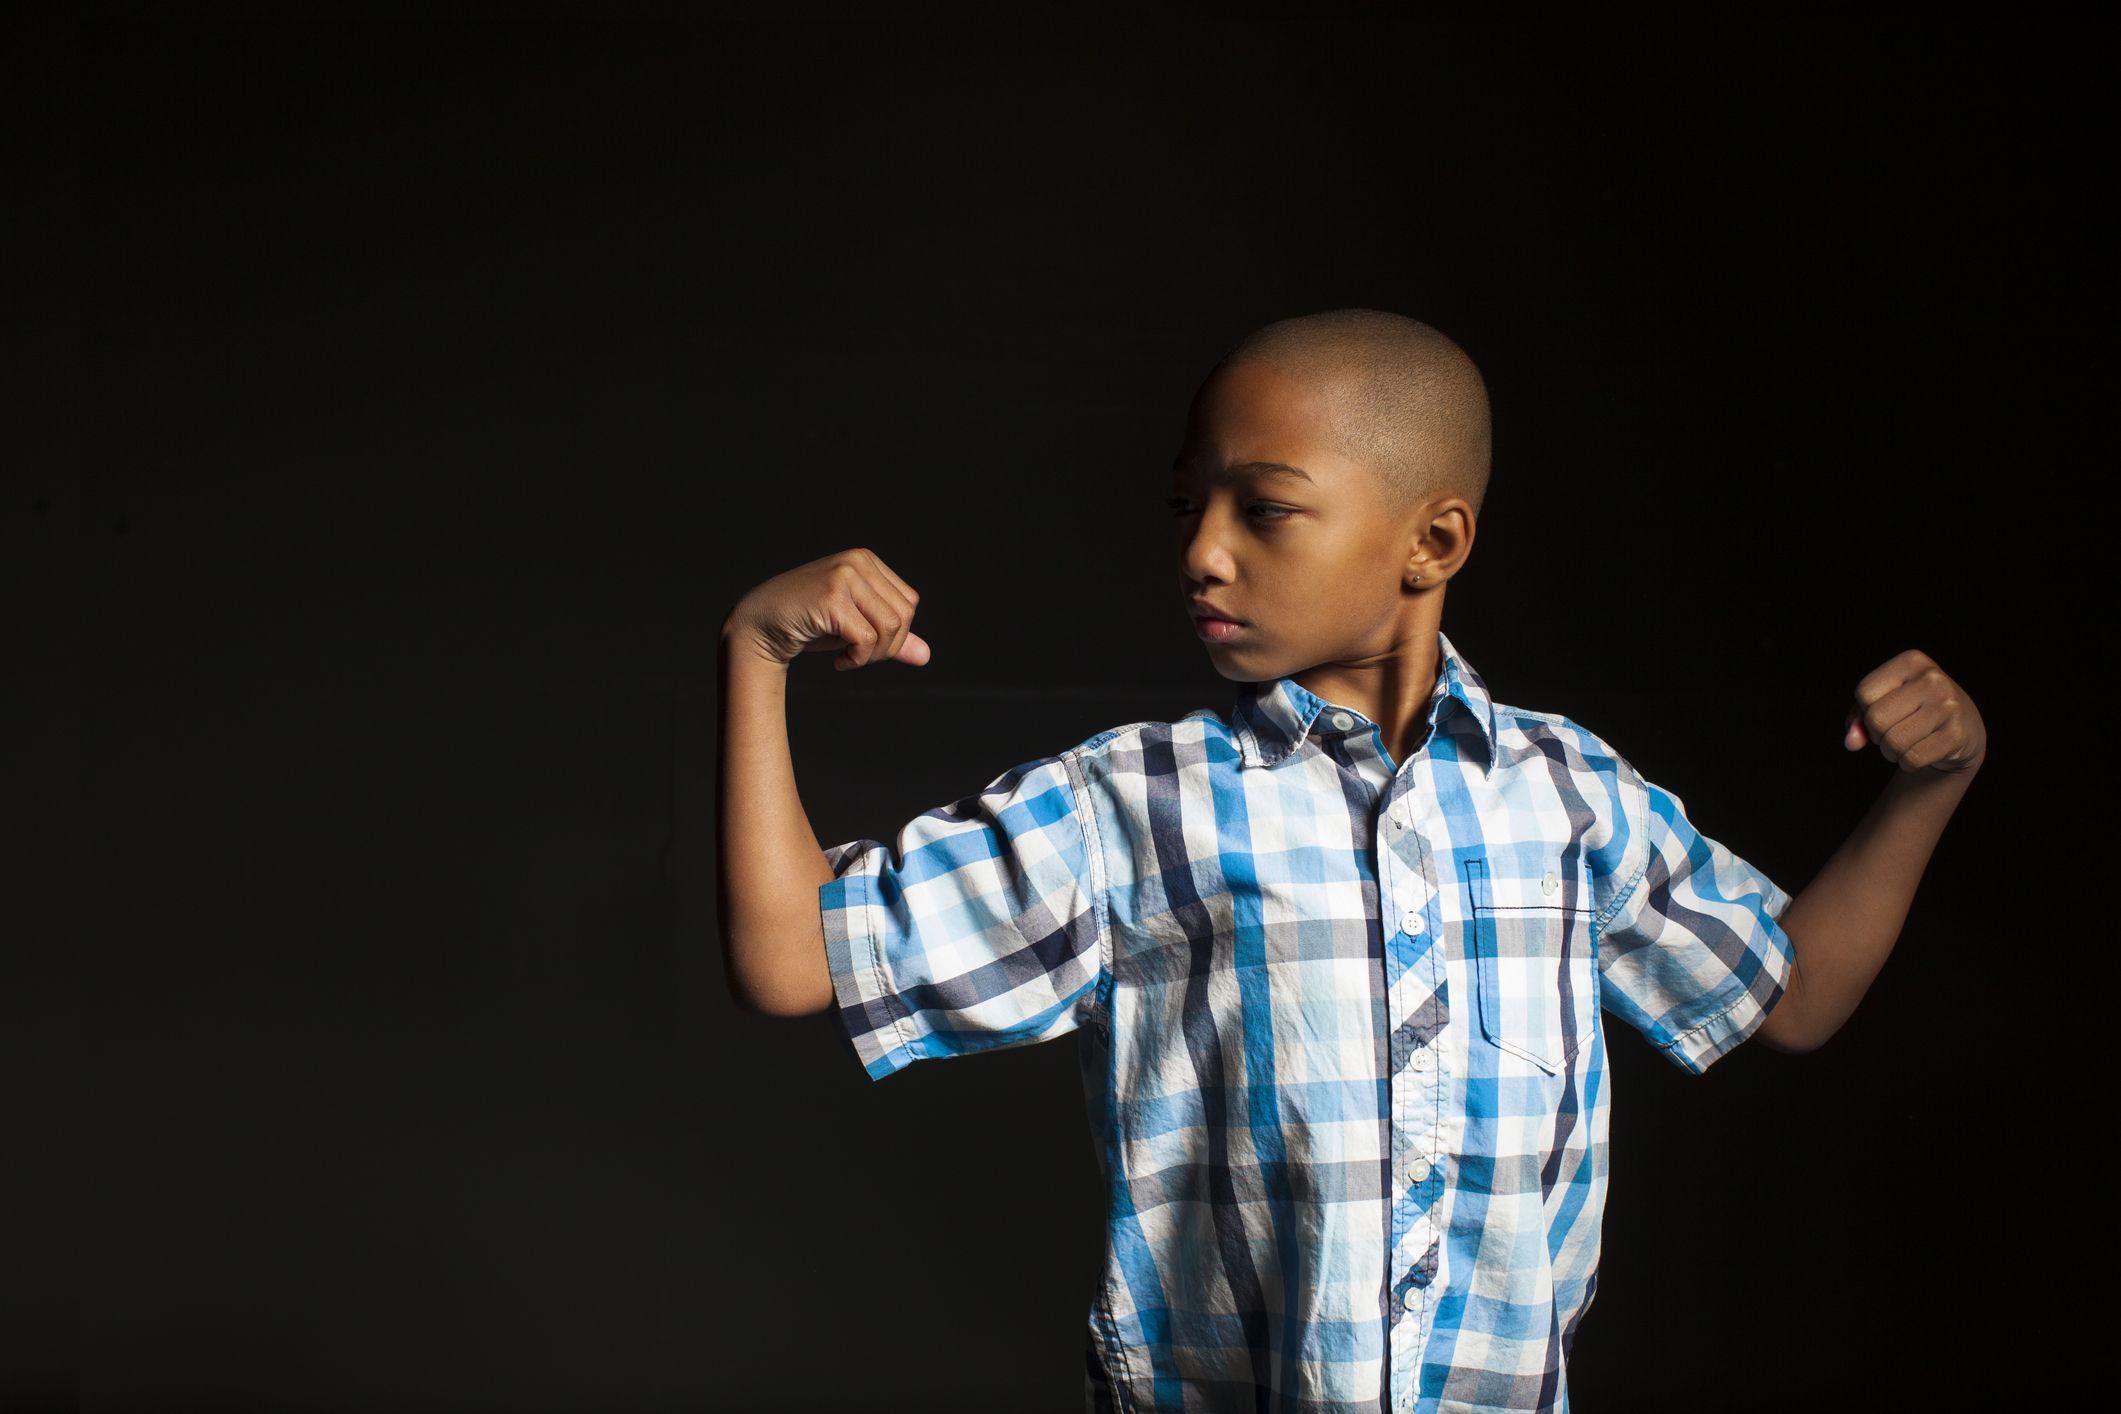 10 Habits That Change Boys Into Men Via Helloparentco